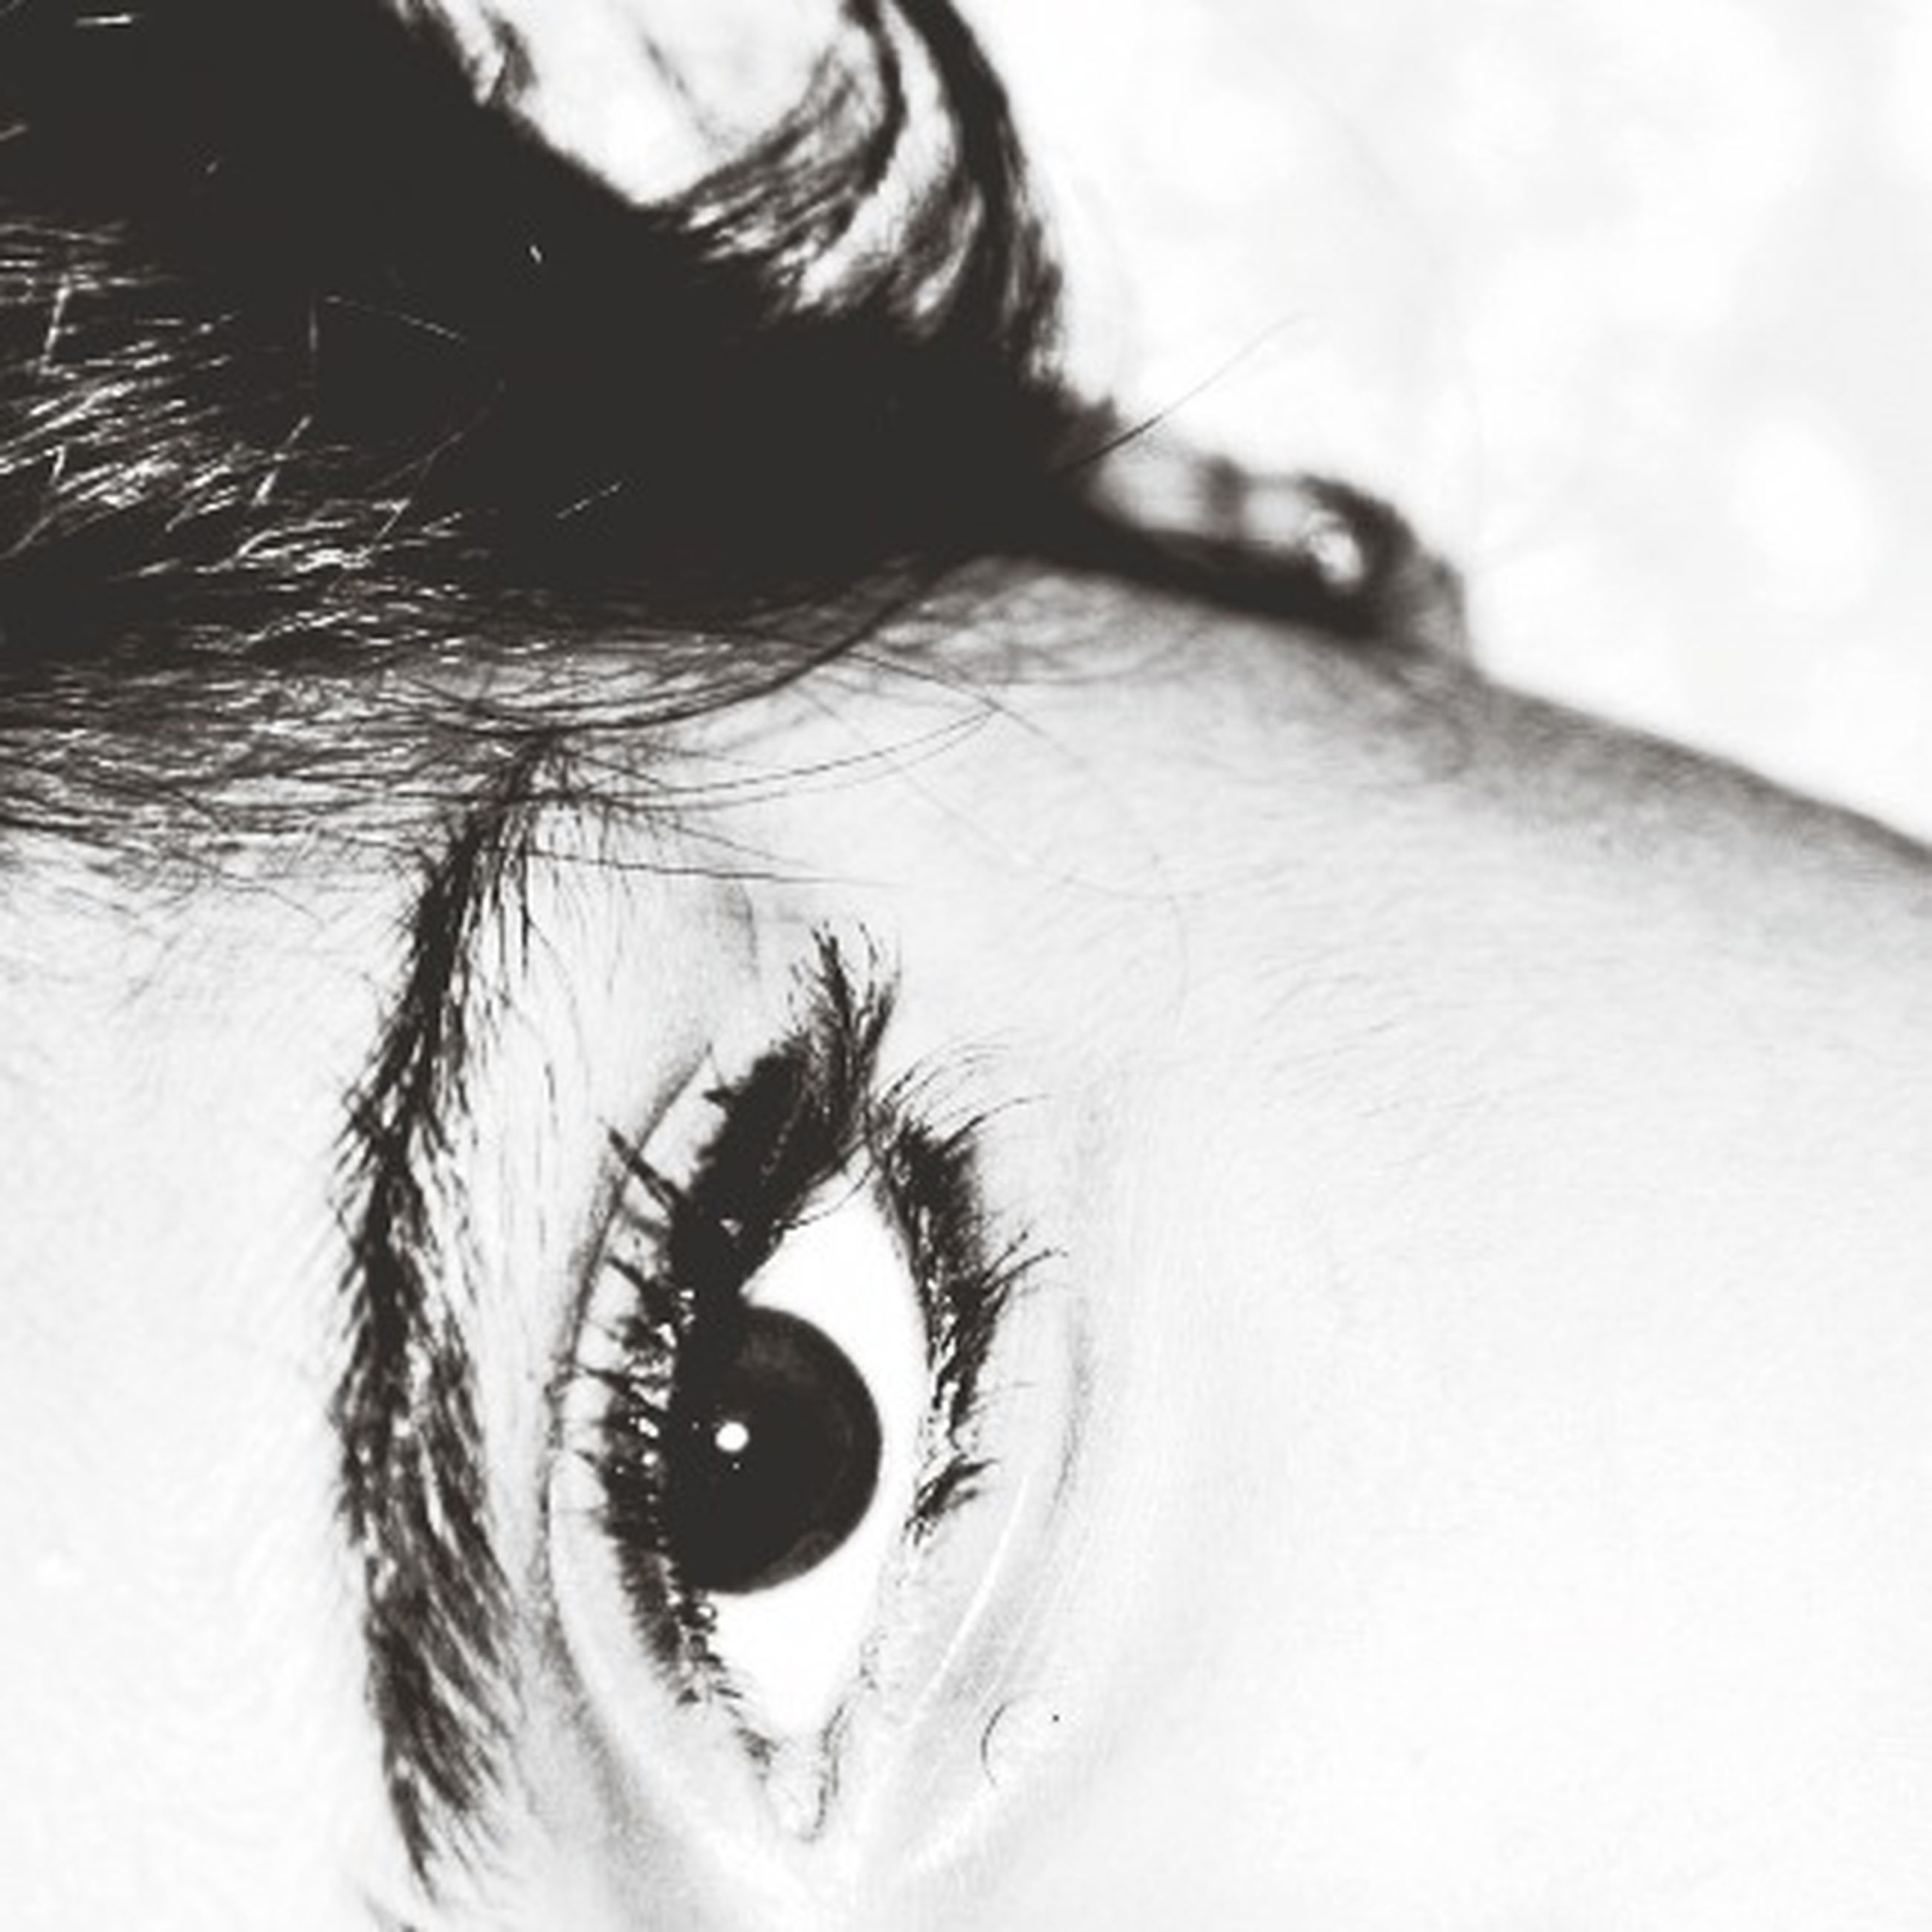 close-up, human eye, indoors, eyesight, sensory perception, part of, eyelash, lifestyles, studio shot, person, human skin, unrecognizable person, white background, cropped, leisure activity, iris - eye, vision